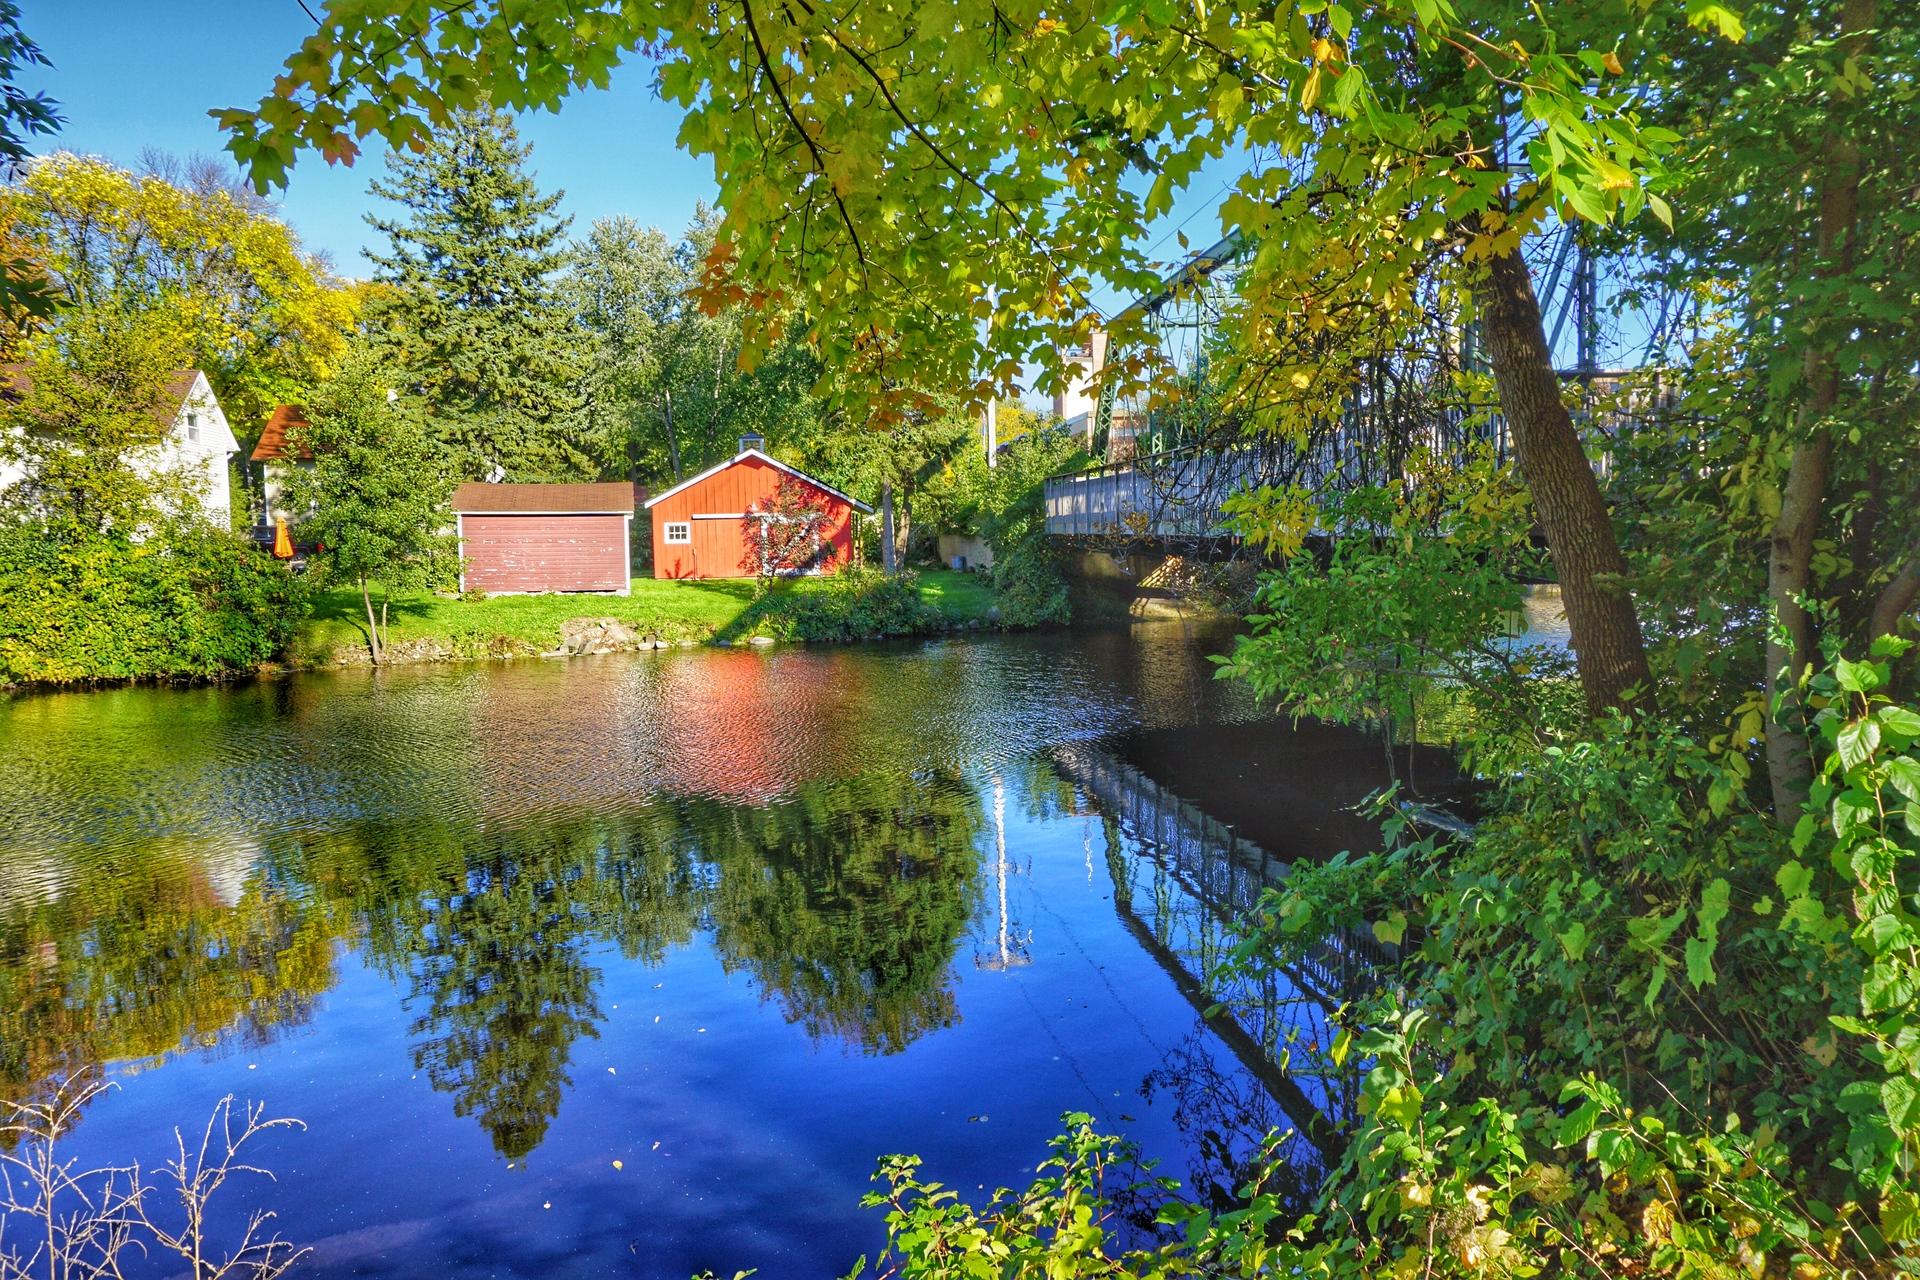 Autumn Reflections | tree, travel, scenic, reflection